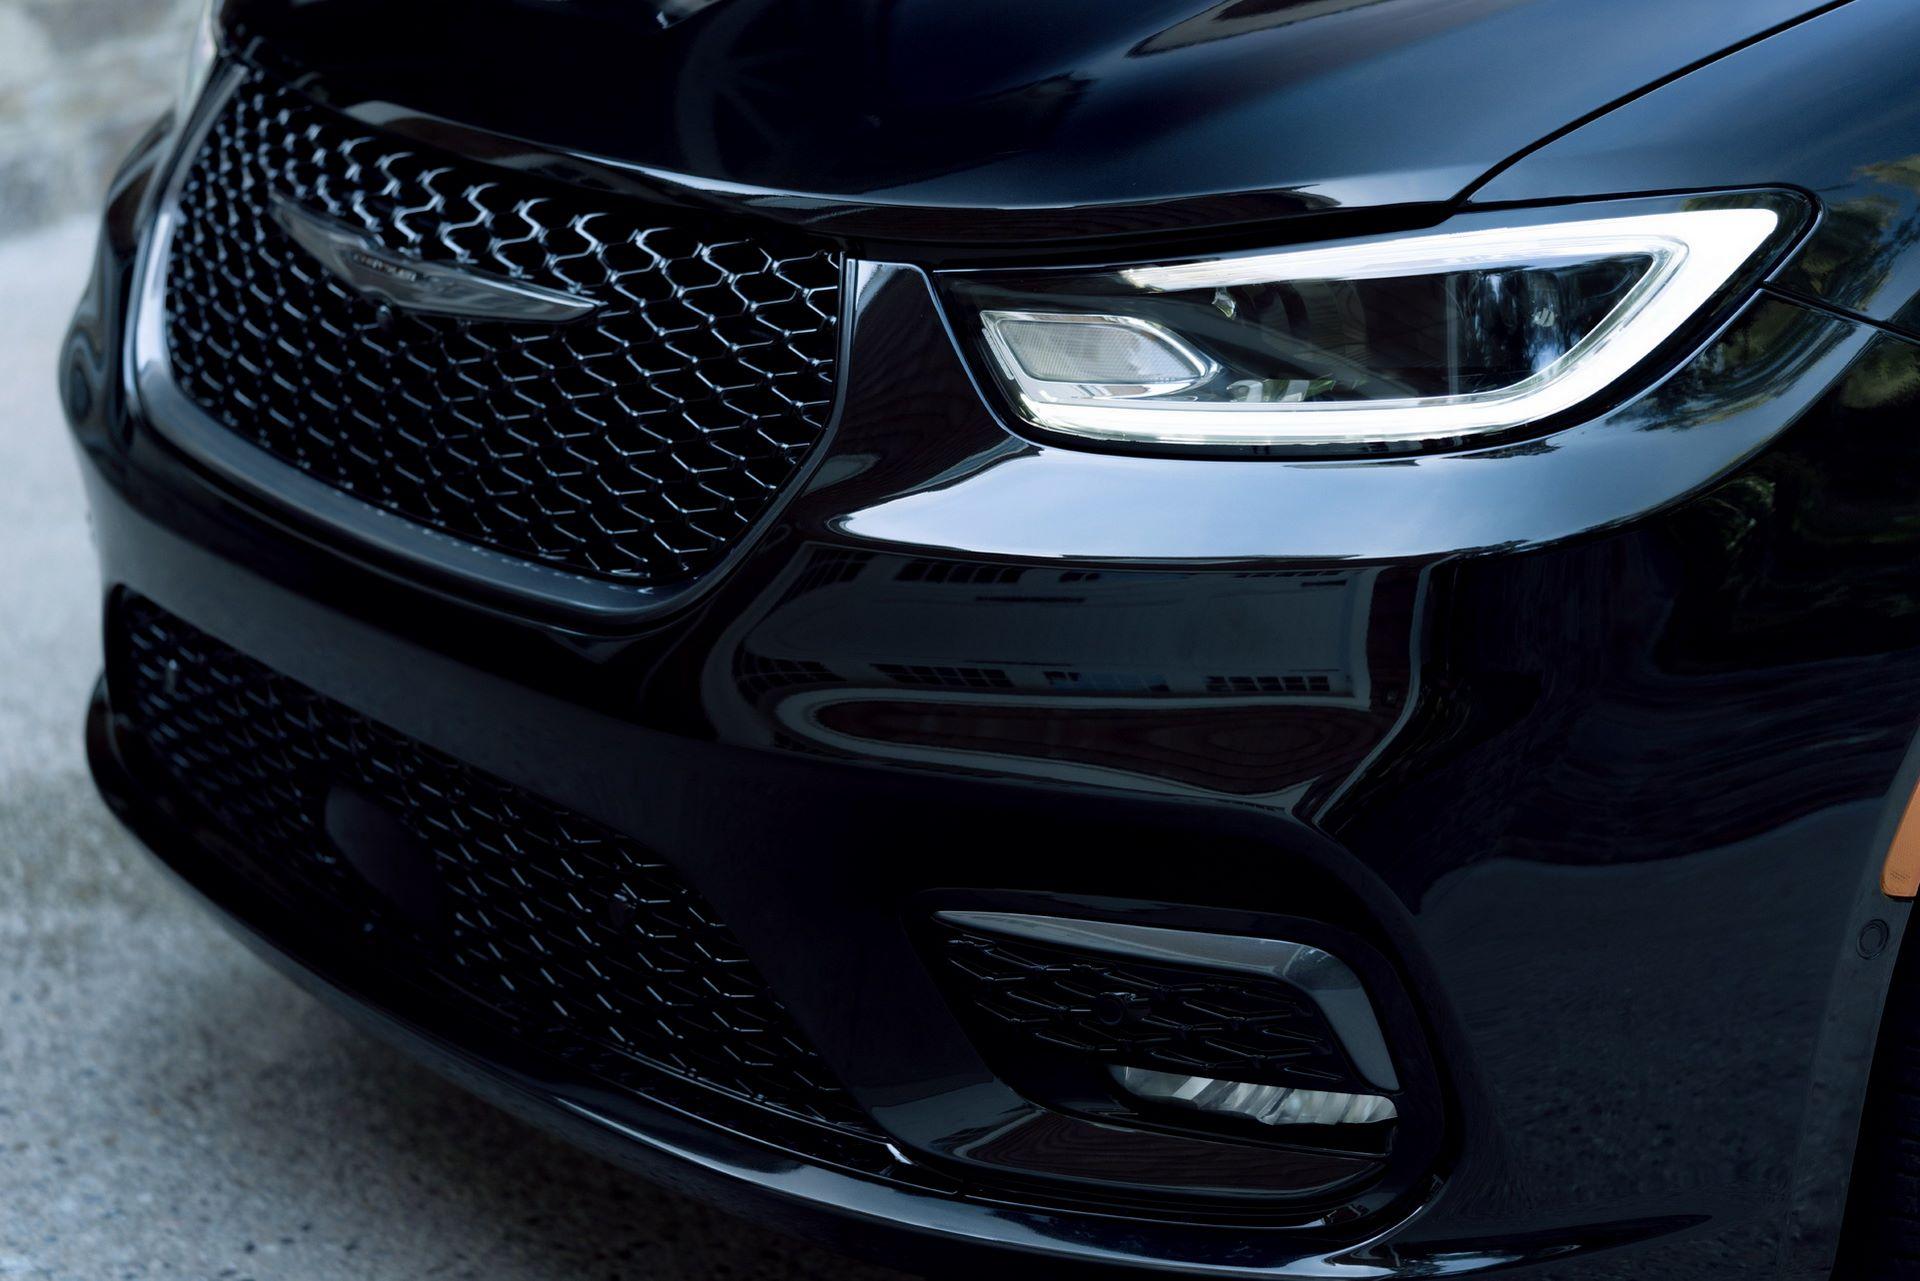 2021-Chrysler-Pacifica-124